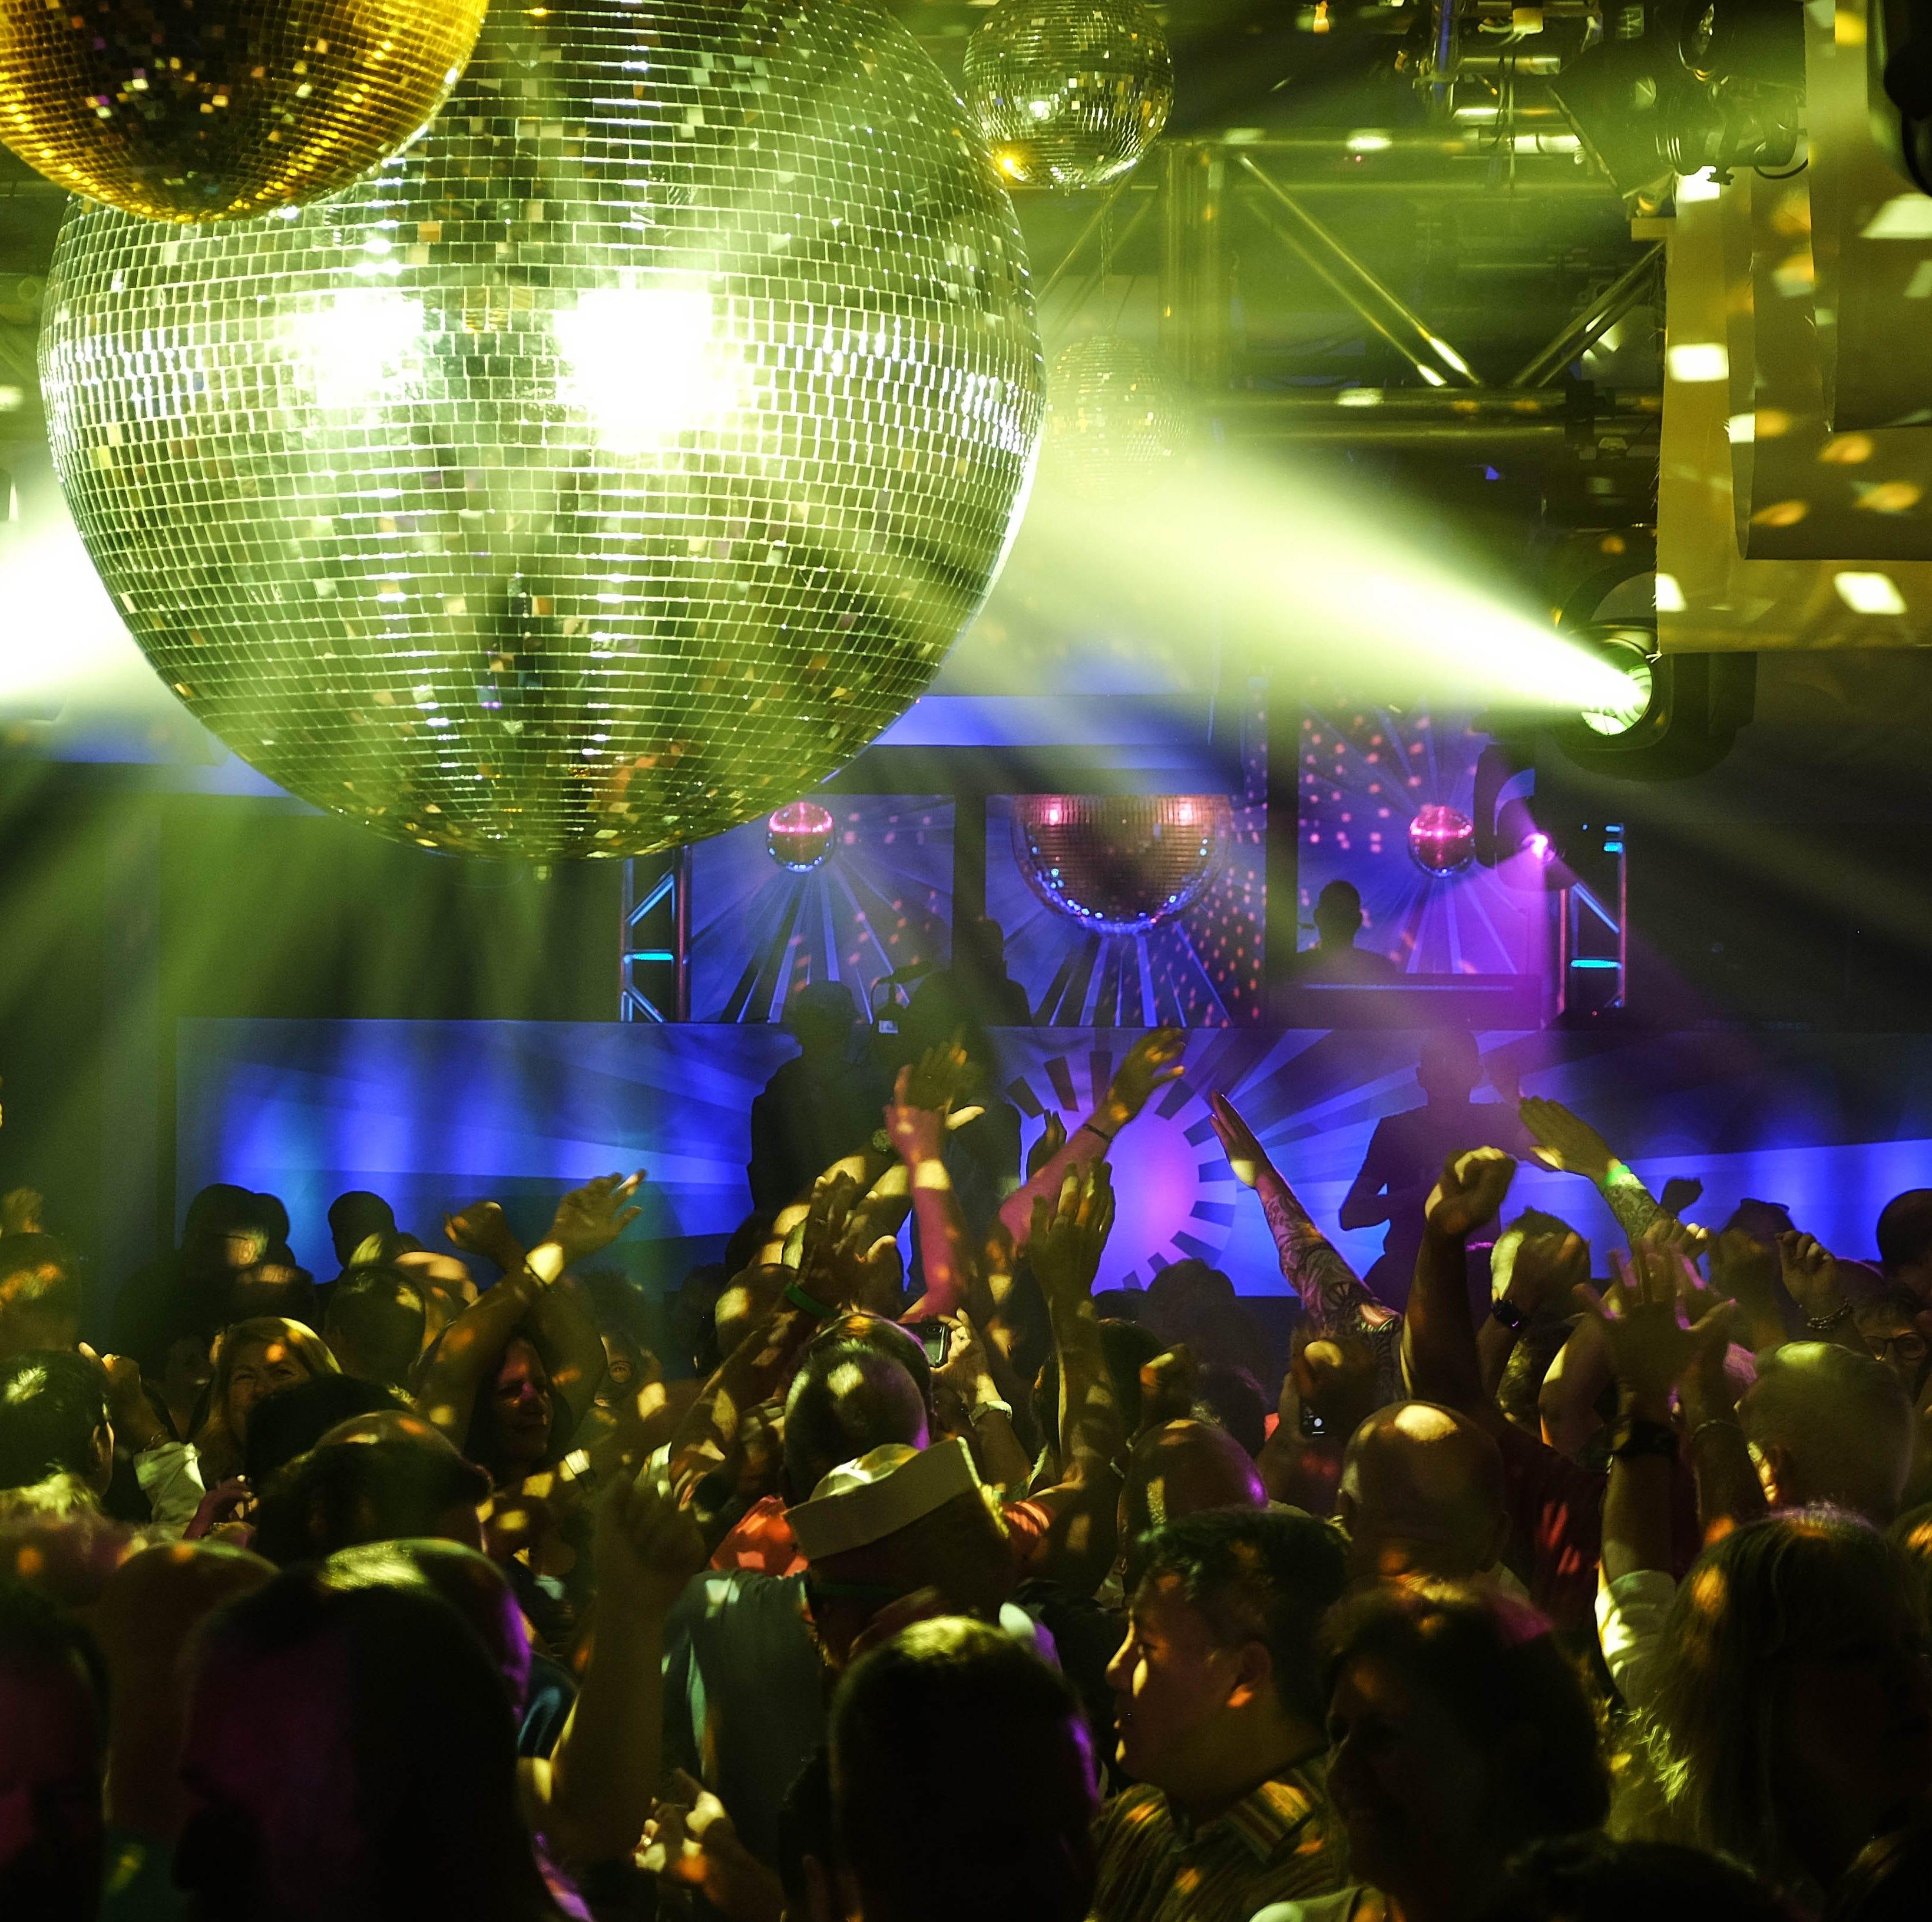 Sundance raises glass, disco ball to CAMP Rehoboth co-founder